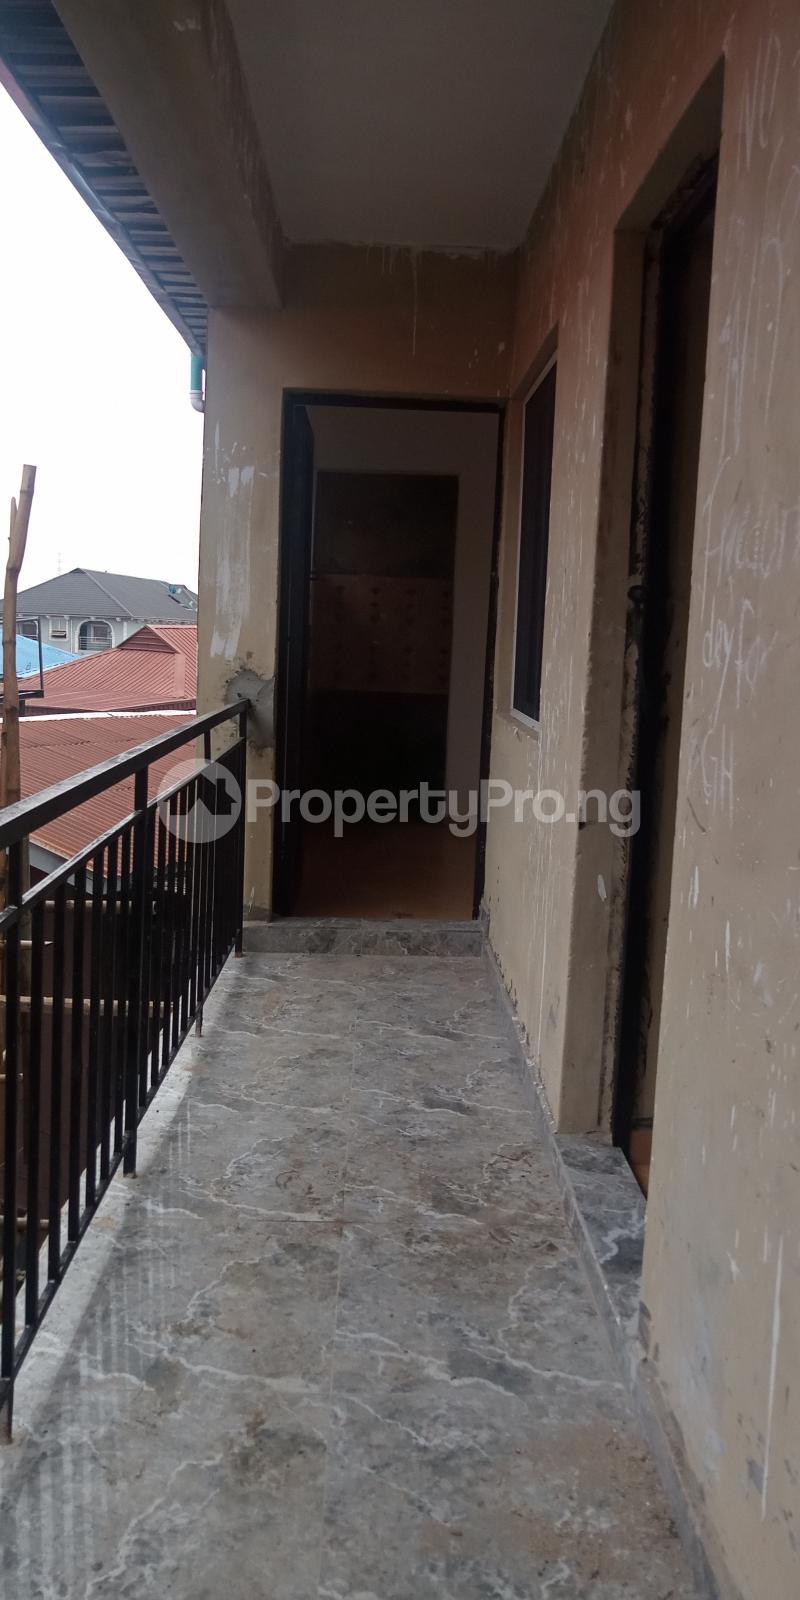 1 bedroom Self Contain for rent Adekunle Ebute Metta Yaba Lagos - 4